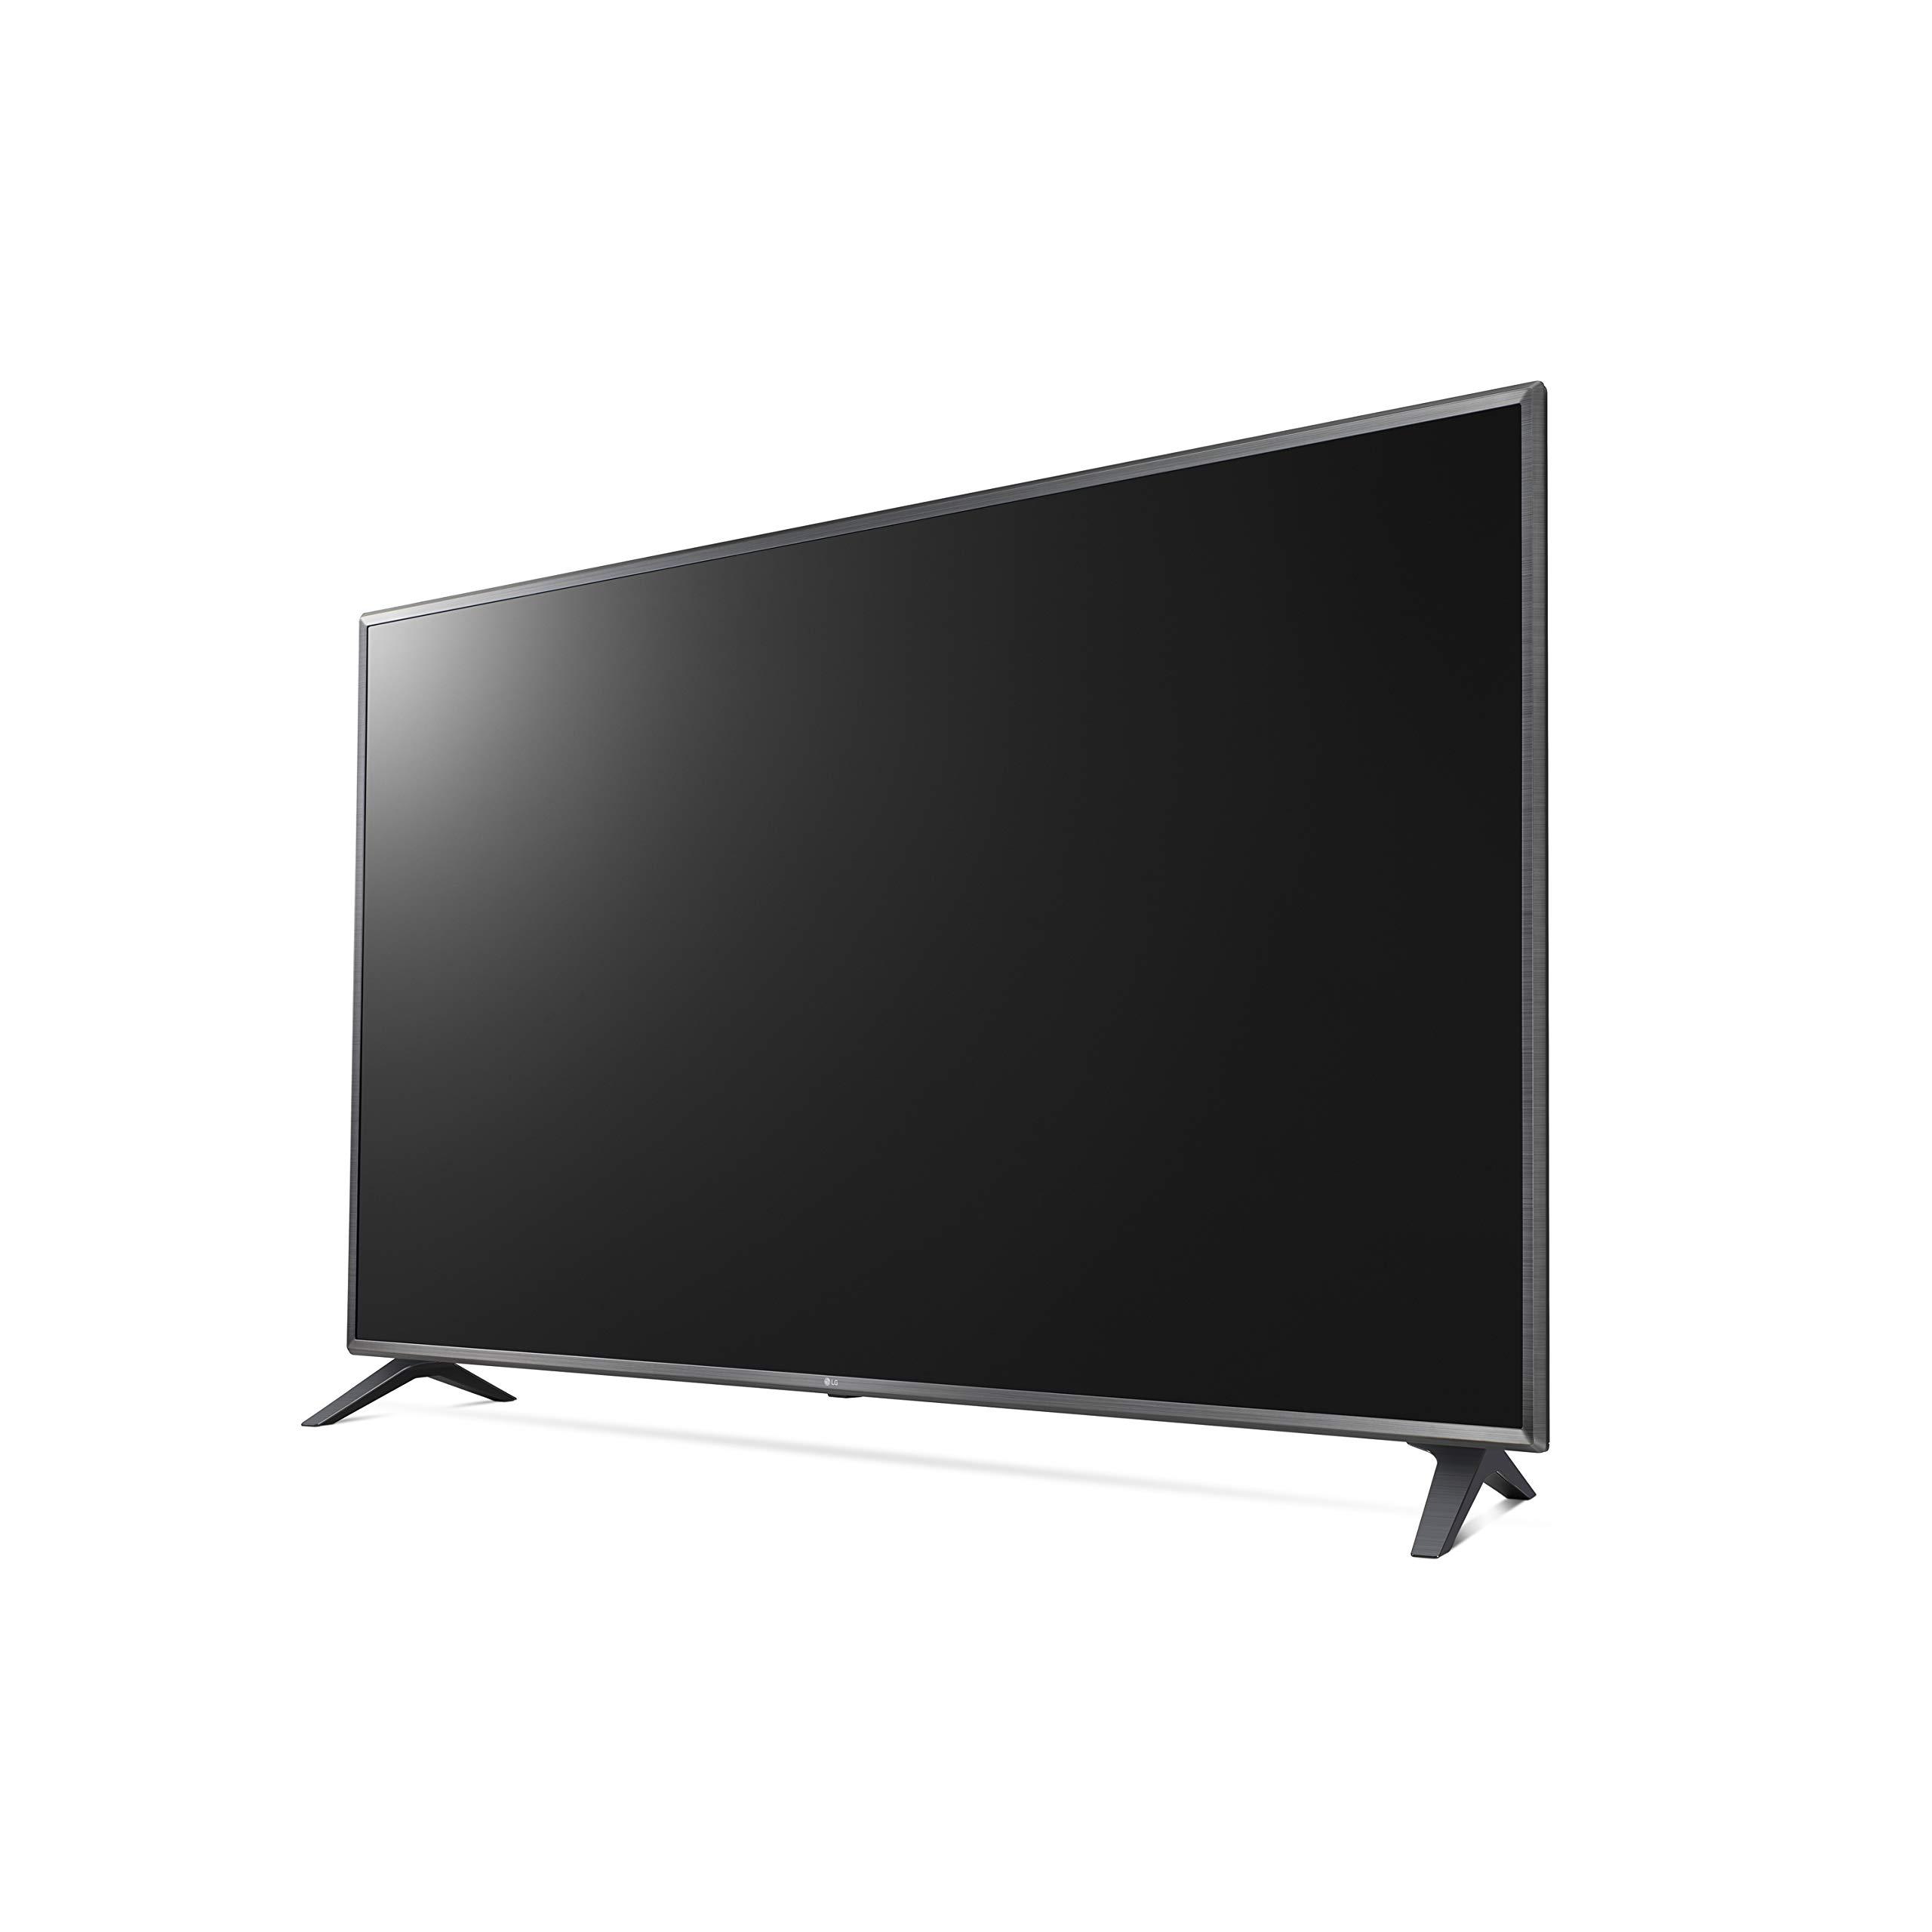 LG 75UK6200 TELEVISOR 75 UHD 4K Smart TV Pantalla IPS: Lg ...